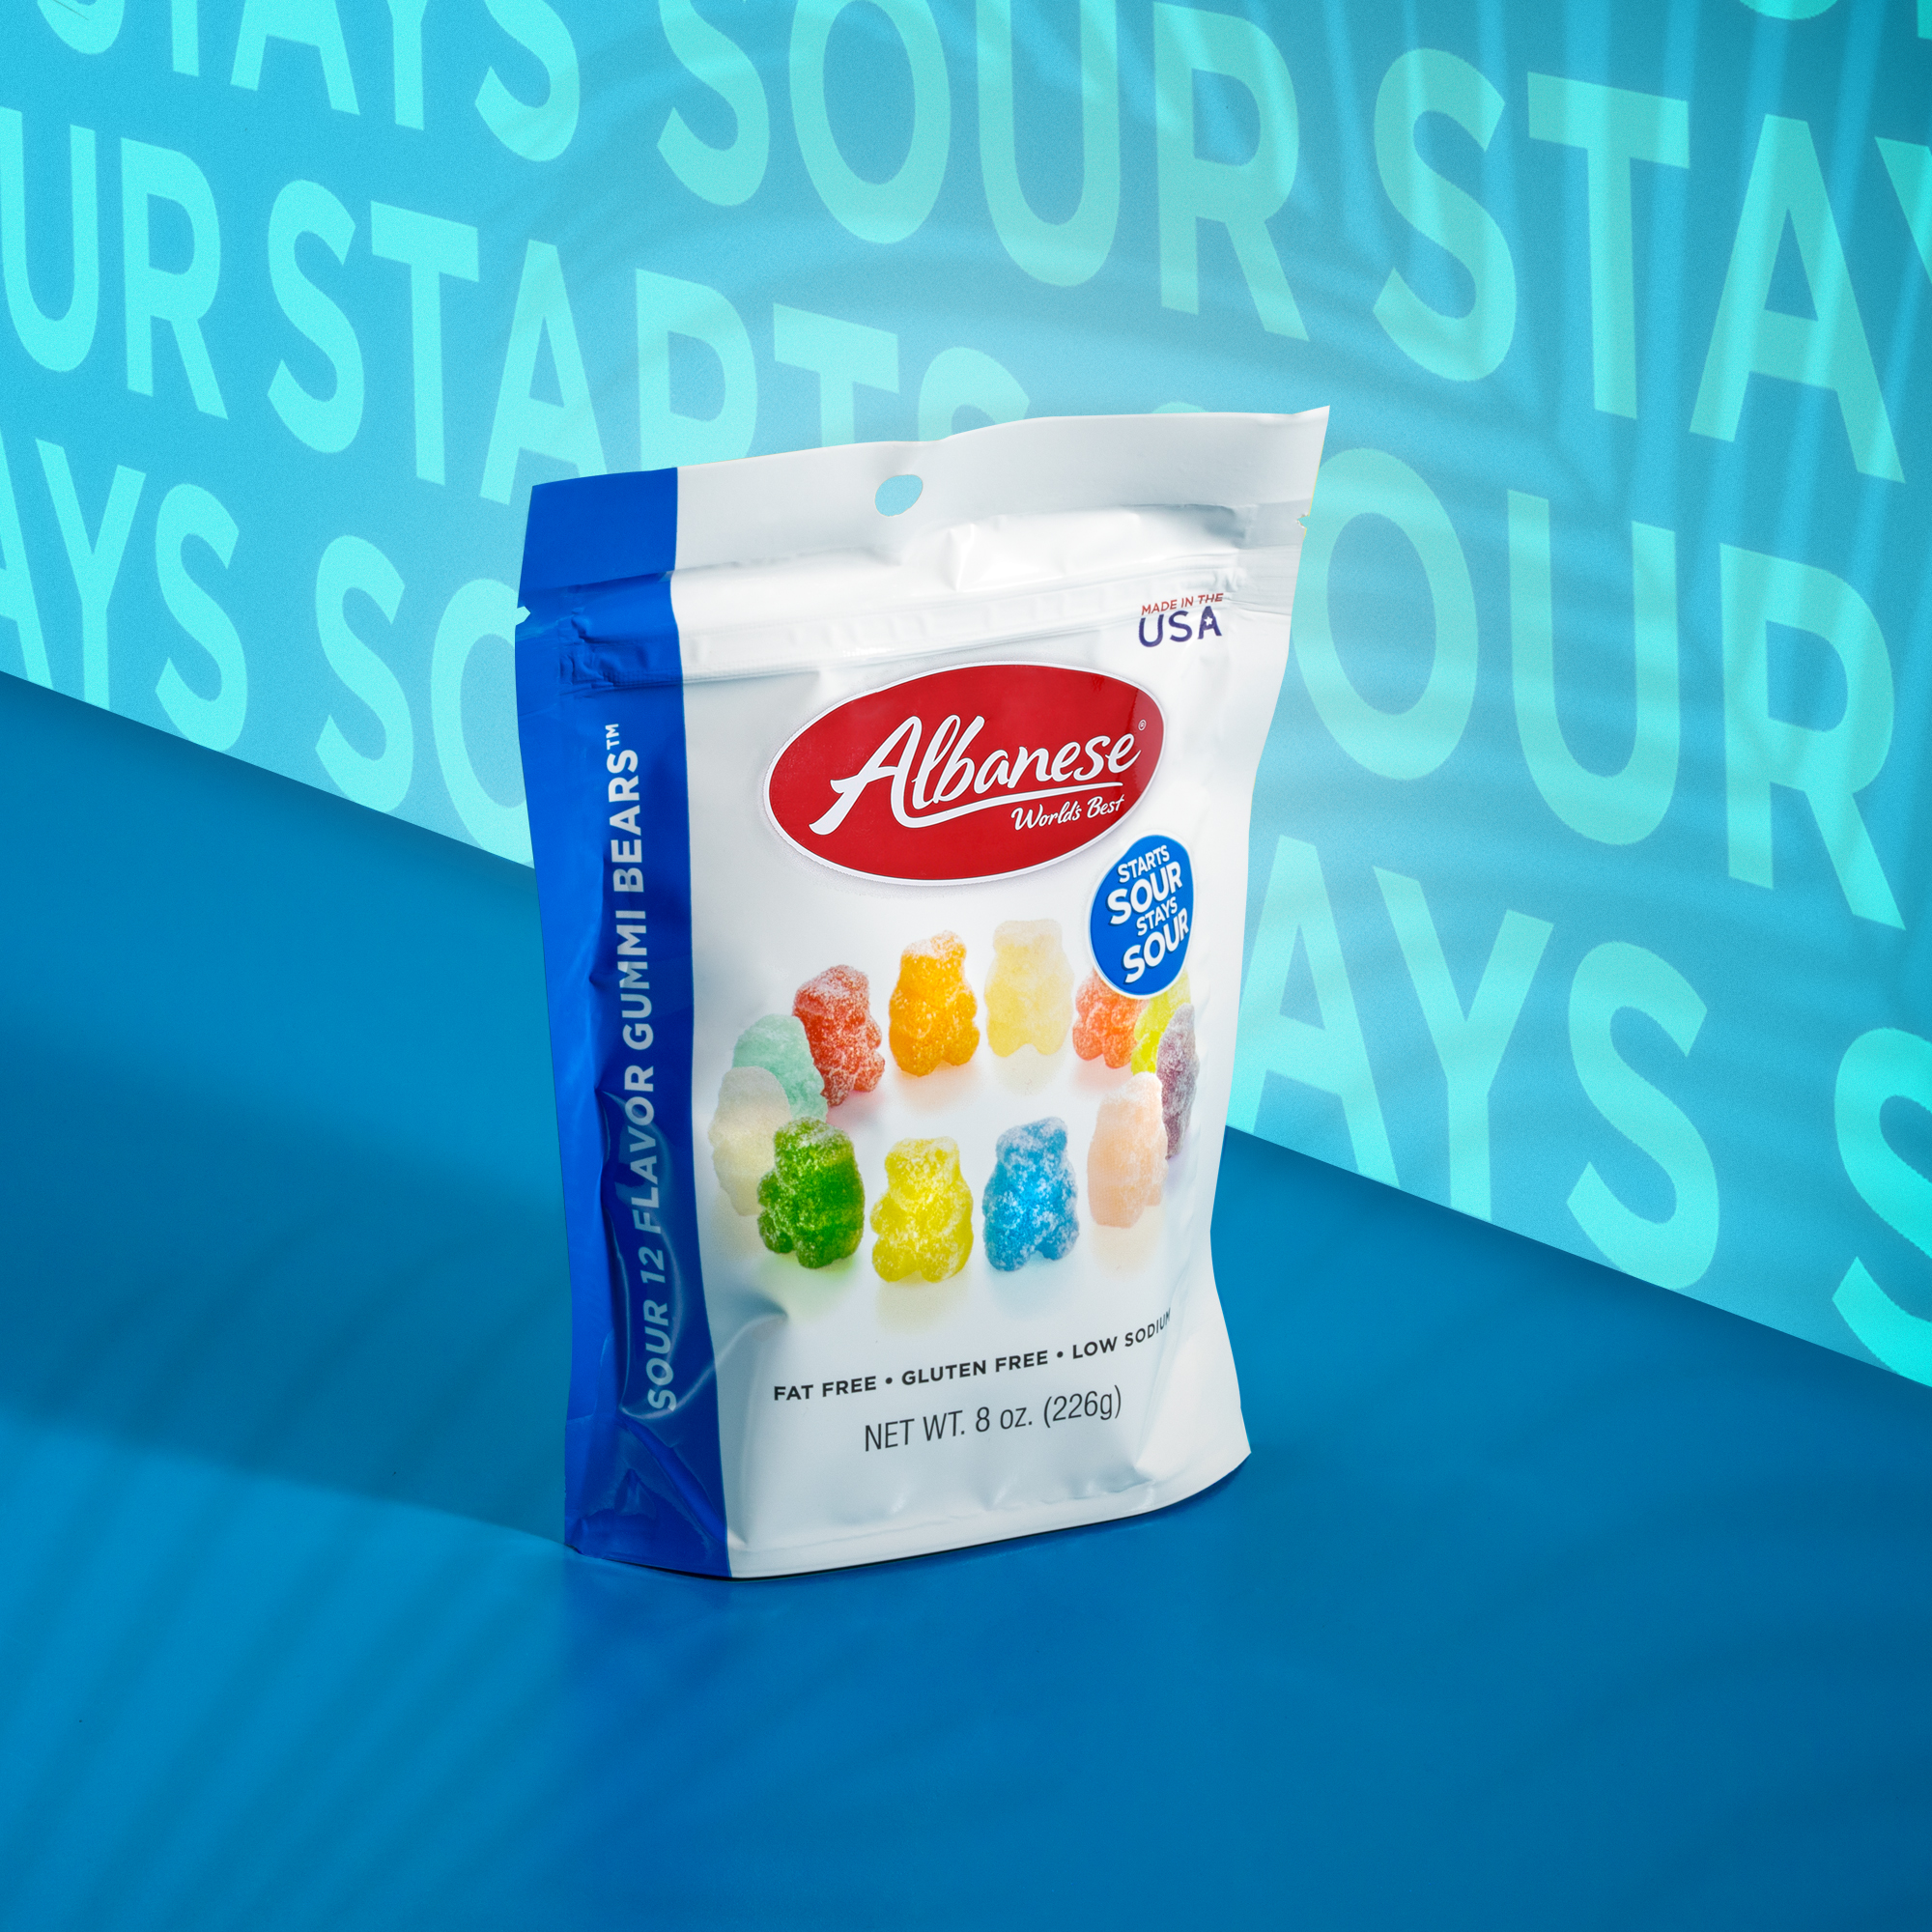 Sour 12 Flavor Gummi Bears®